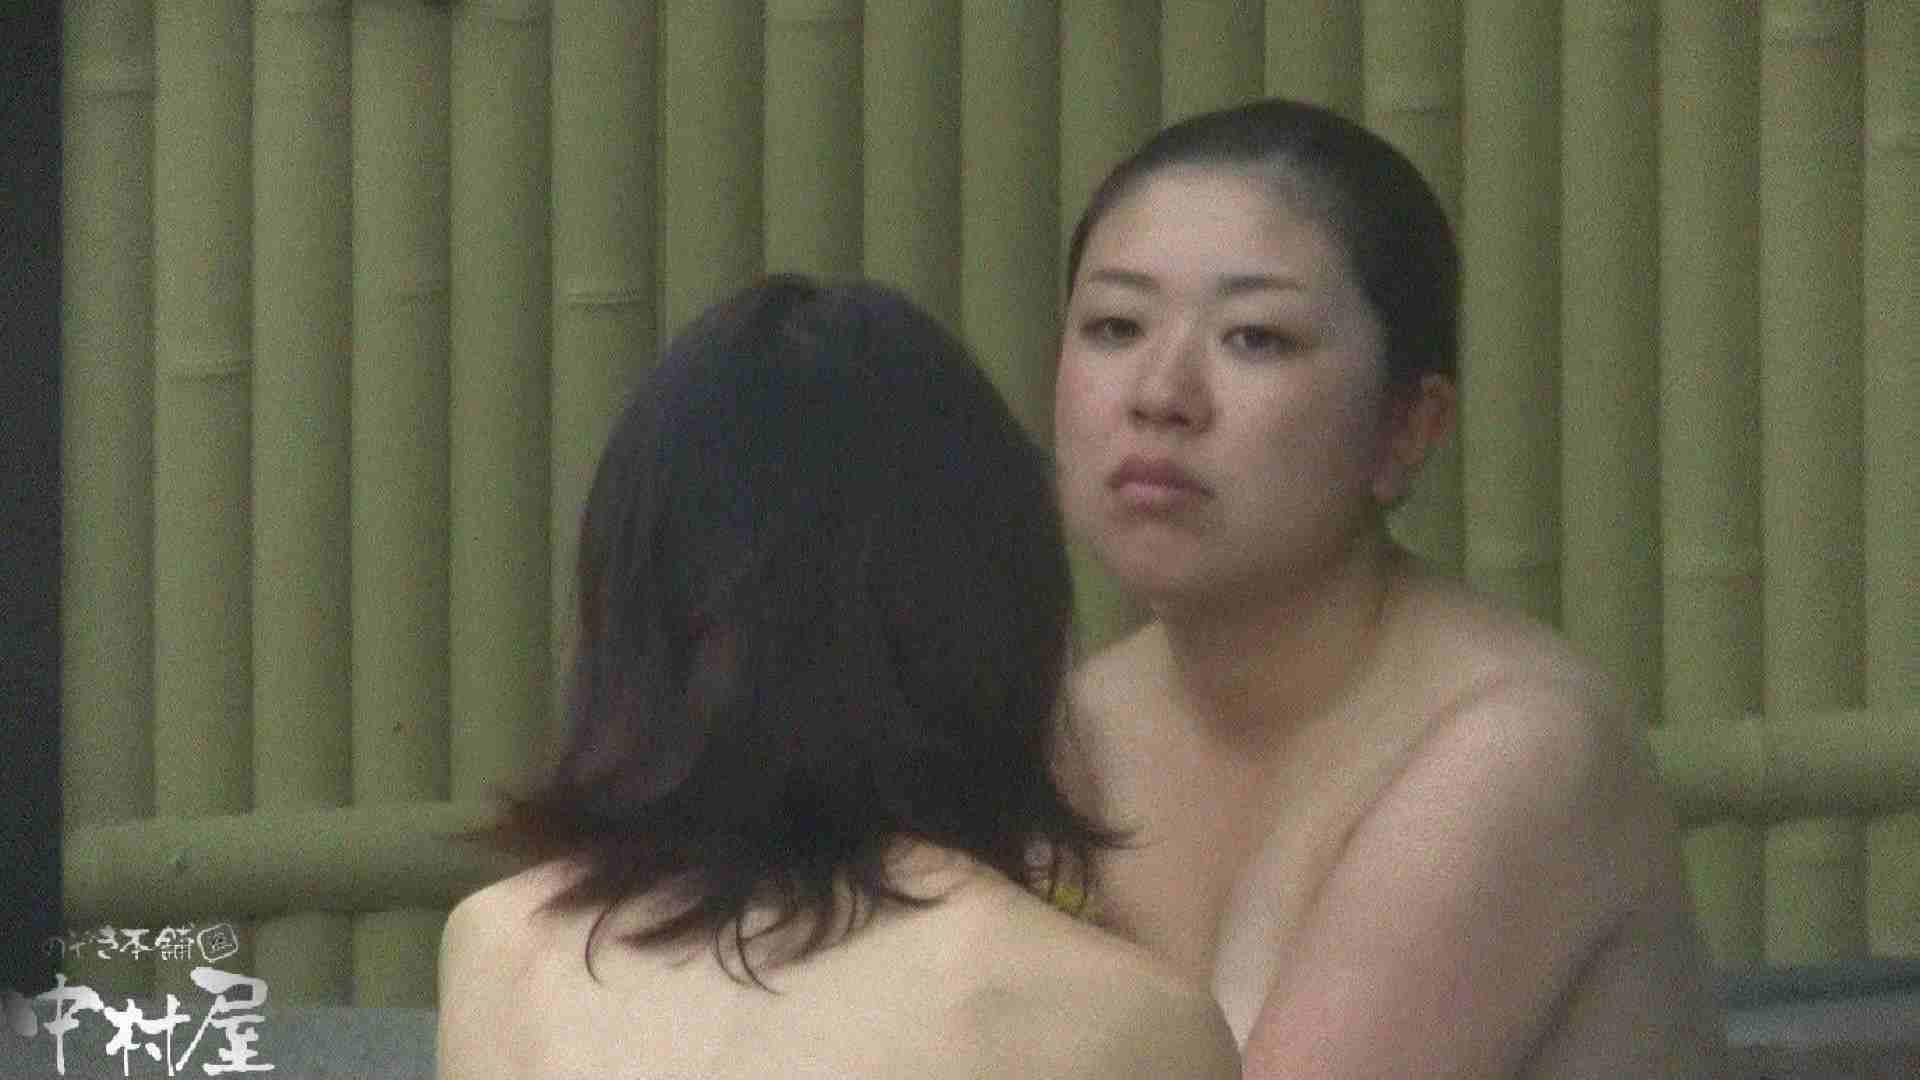 Aquaな露天風呂Vol.917 OLセックス   盗撮  102画像 1